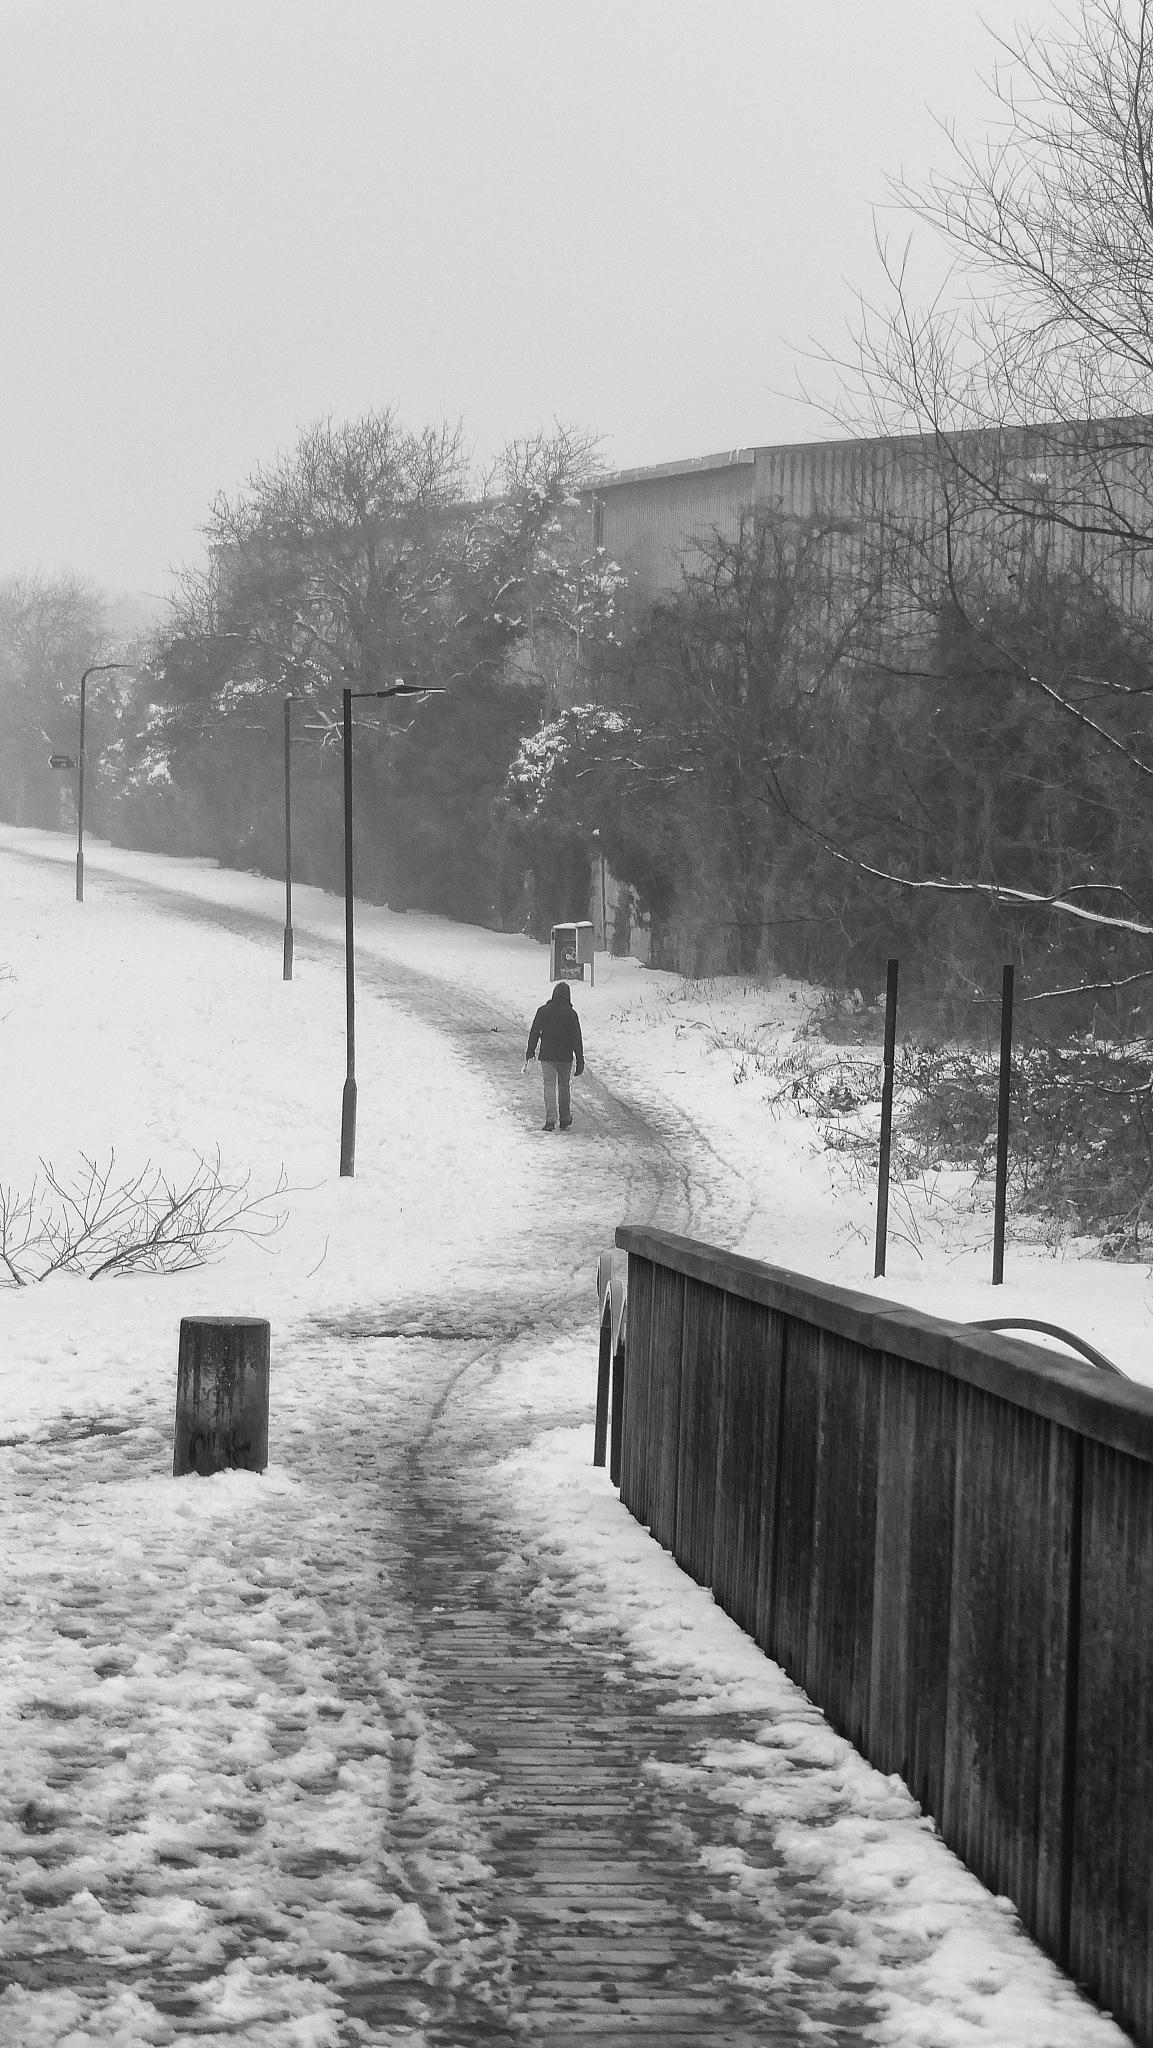 Long Walk Home by Steven Iodice